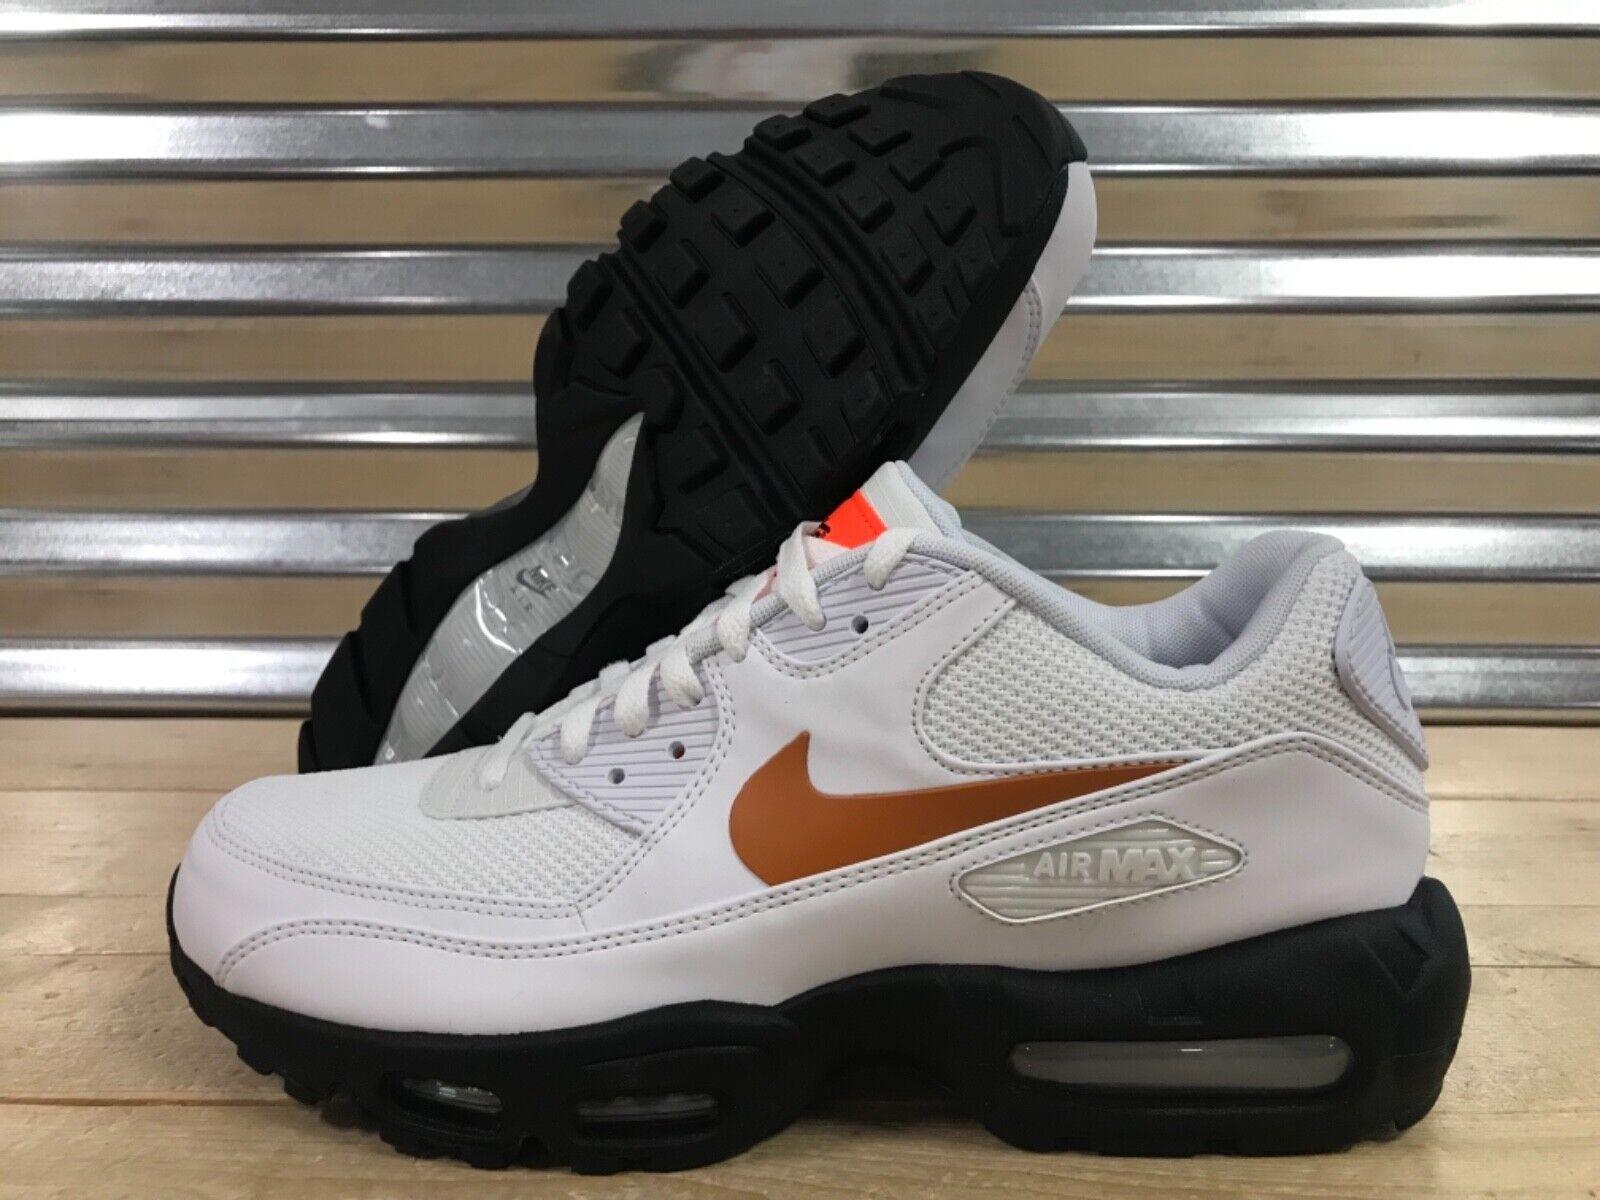 Nike Patta x Air Max 95 95 95   90 iD Hybrid scarpe bianca nero oro SZ 11 (CJ7193-991) d5df8e